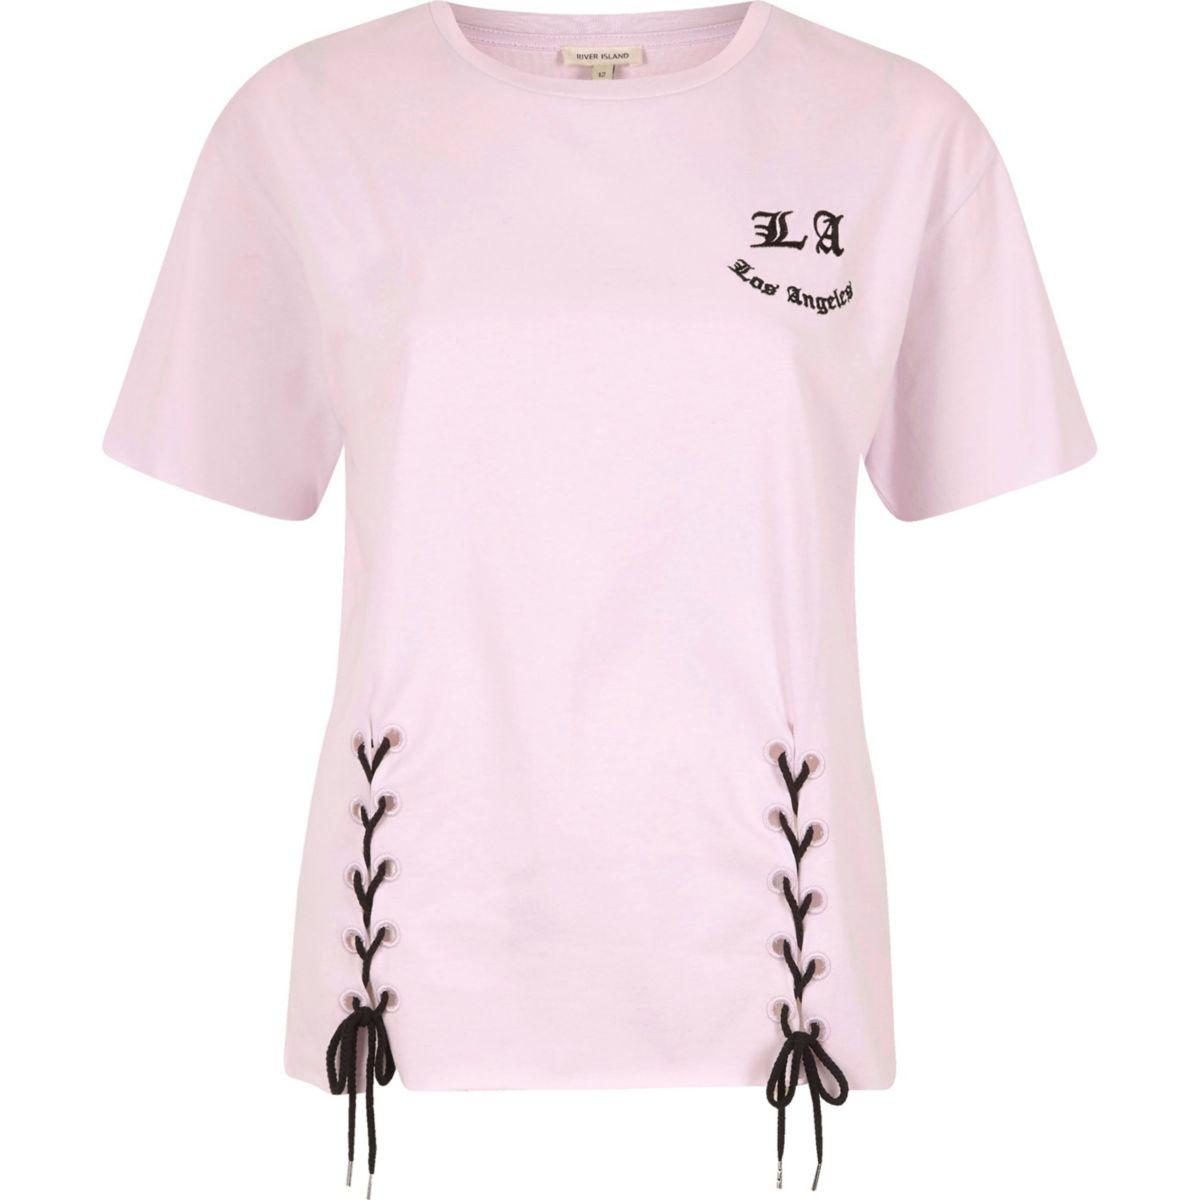 Purple 'Los Angeles' print lace-up T-shirt